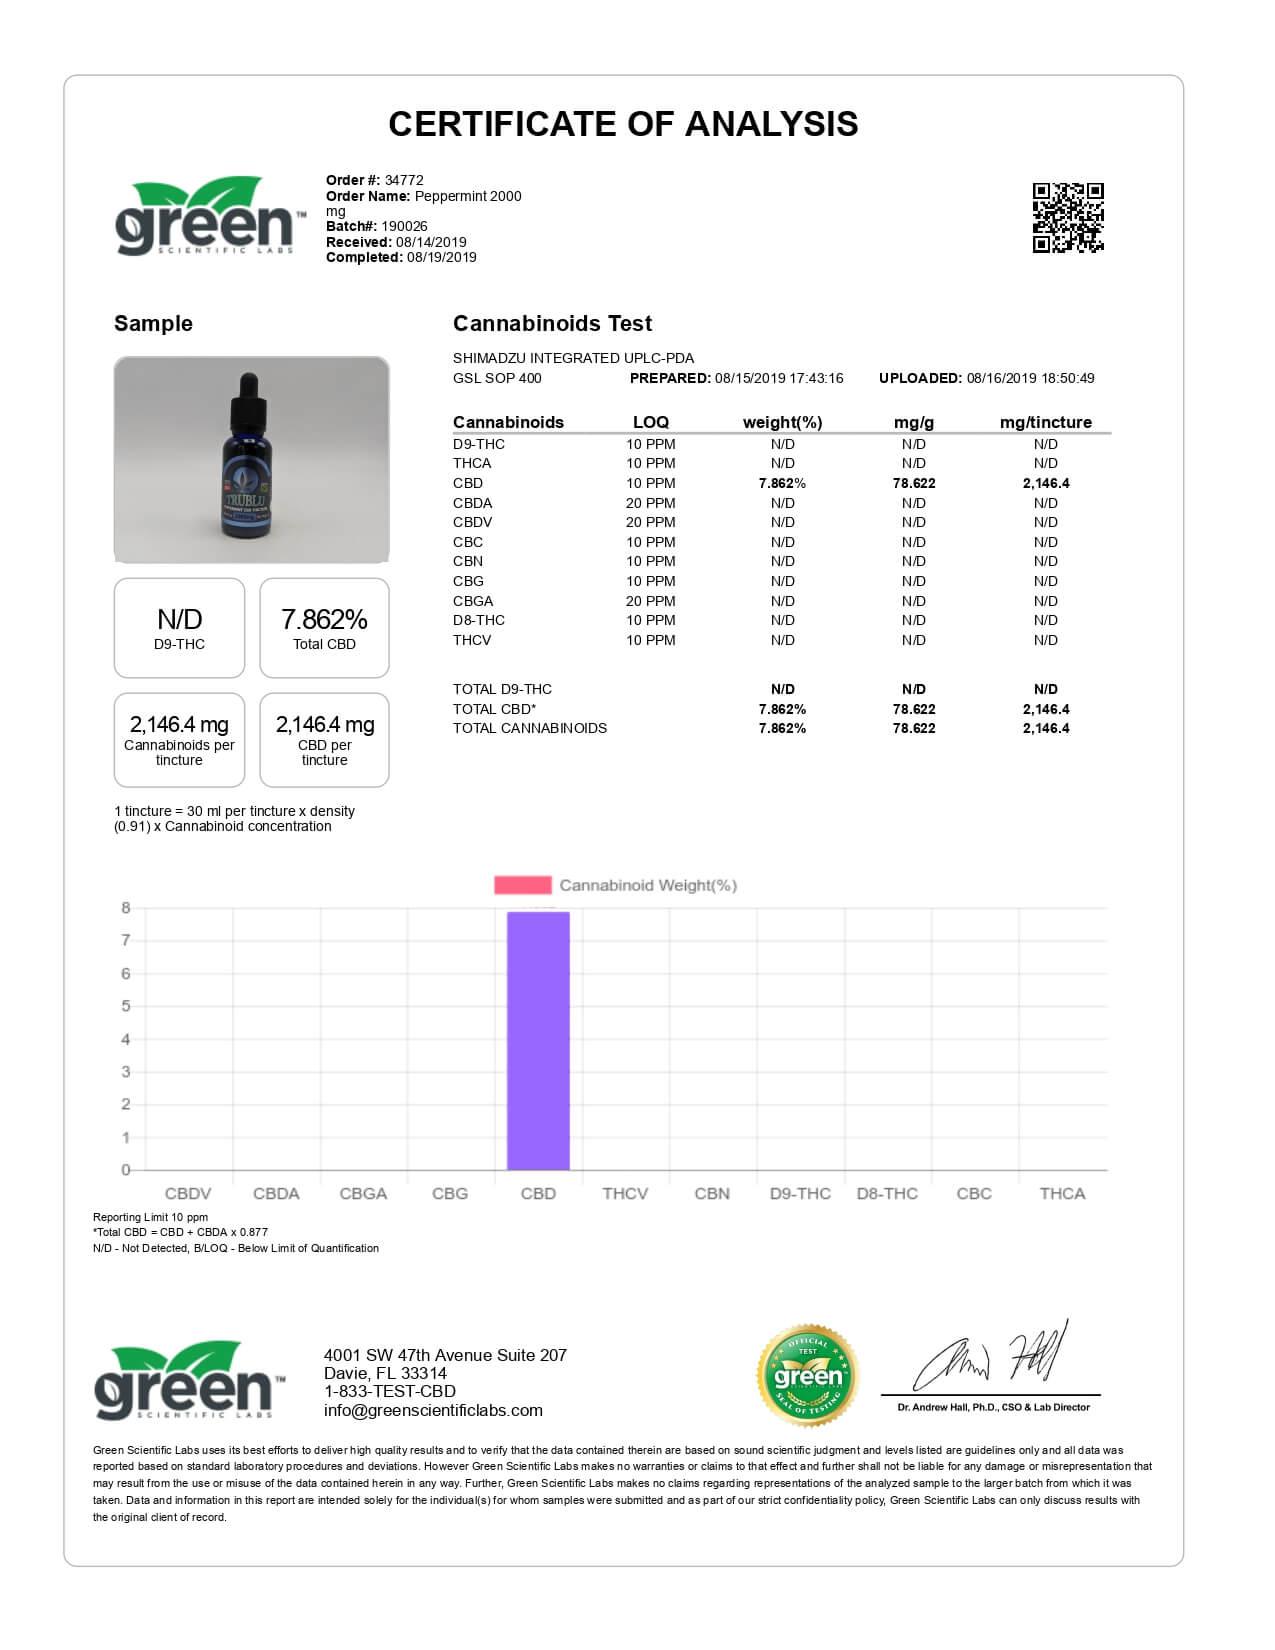 Blue Moon Hemp CBD Tincture Tru Blu Peppermint 2000mg Lab Reports